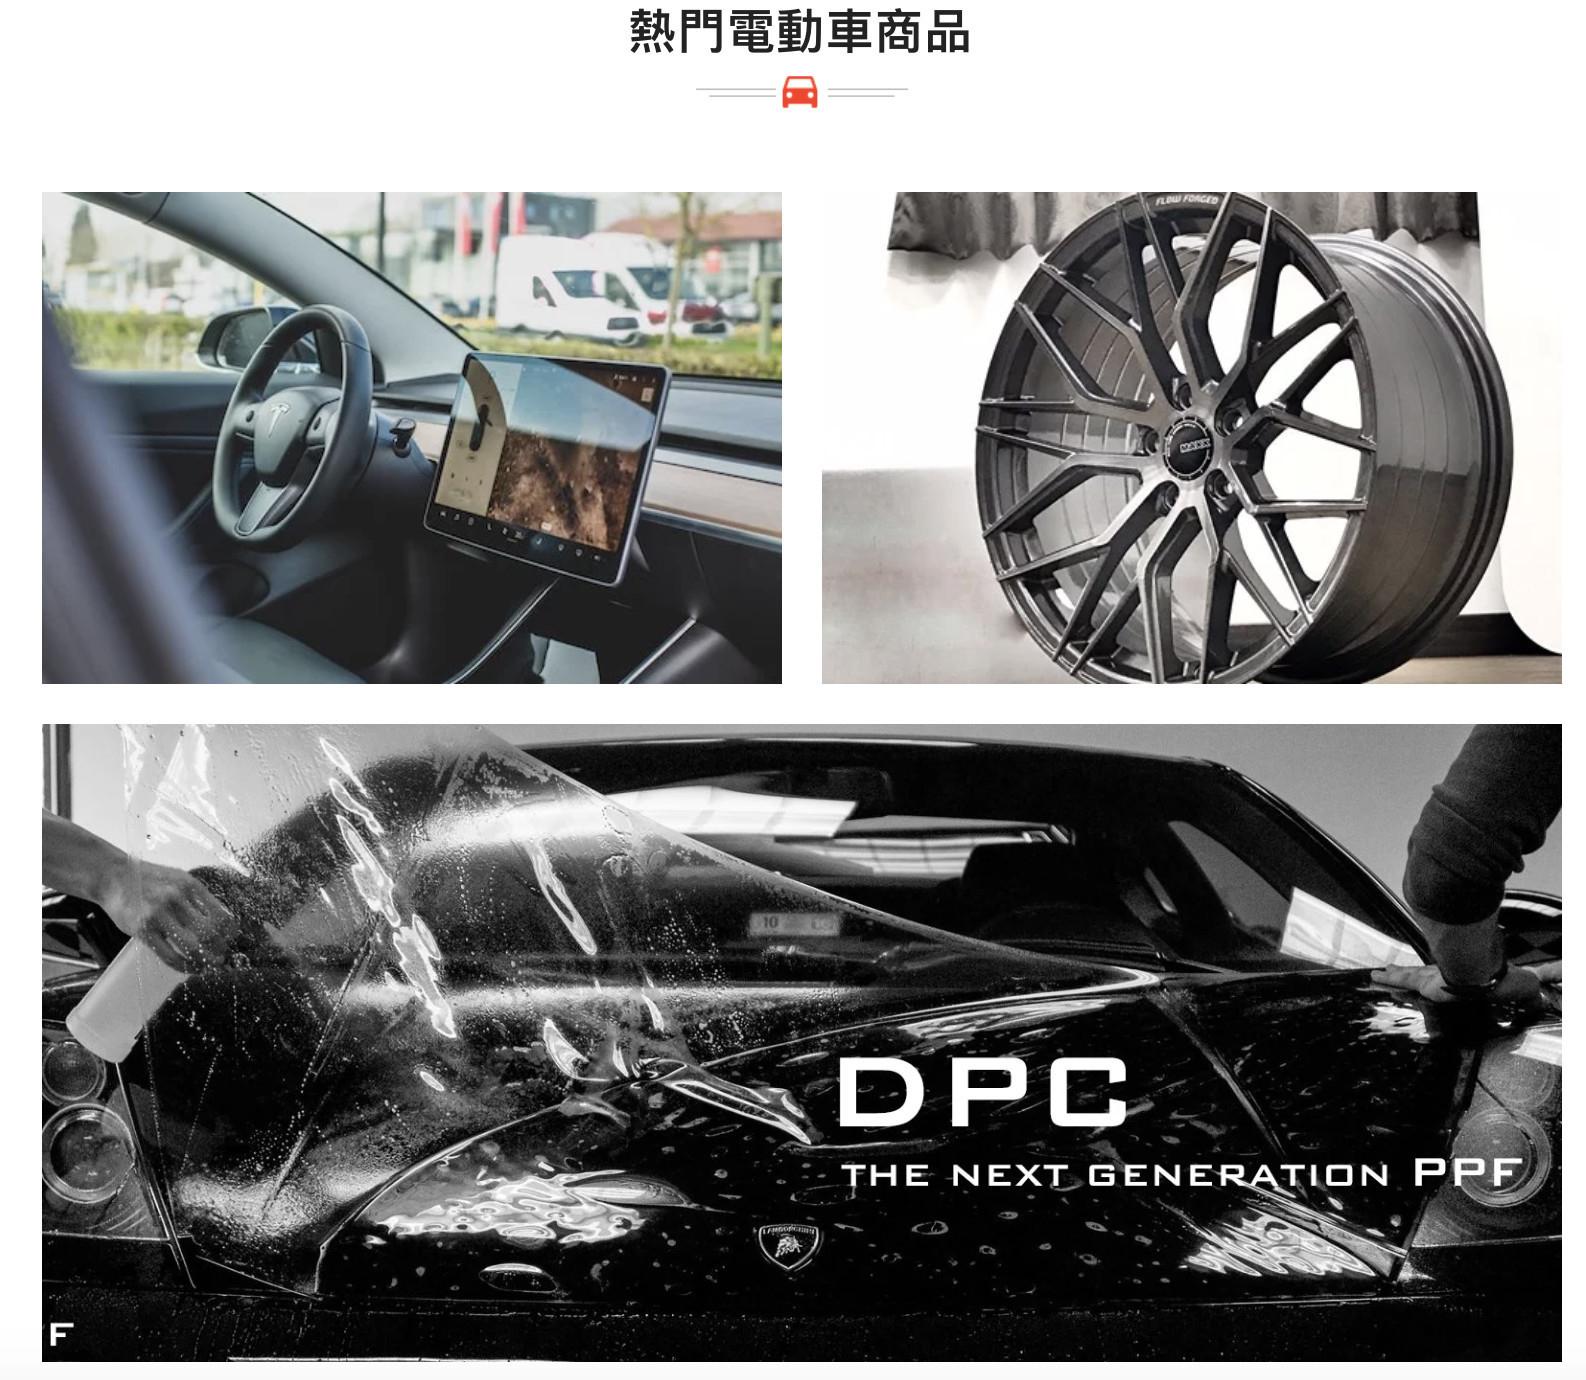 TEC-TESLA EQUIPMENT CENTER 台灣電動車保養改裝廠 網站風格